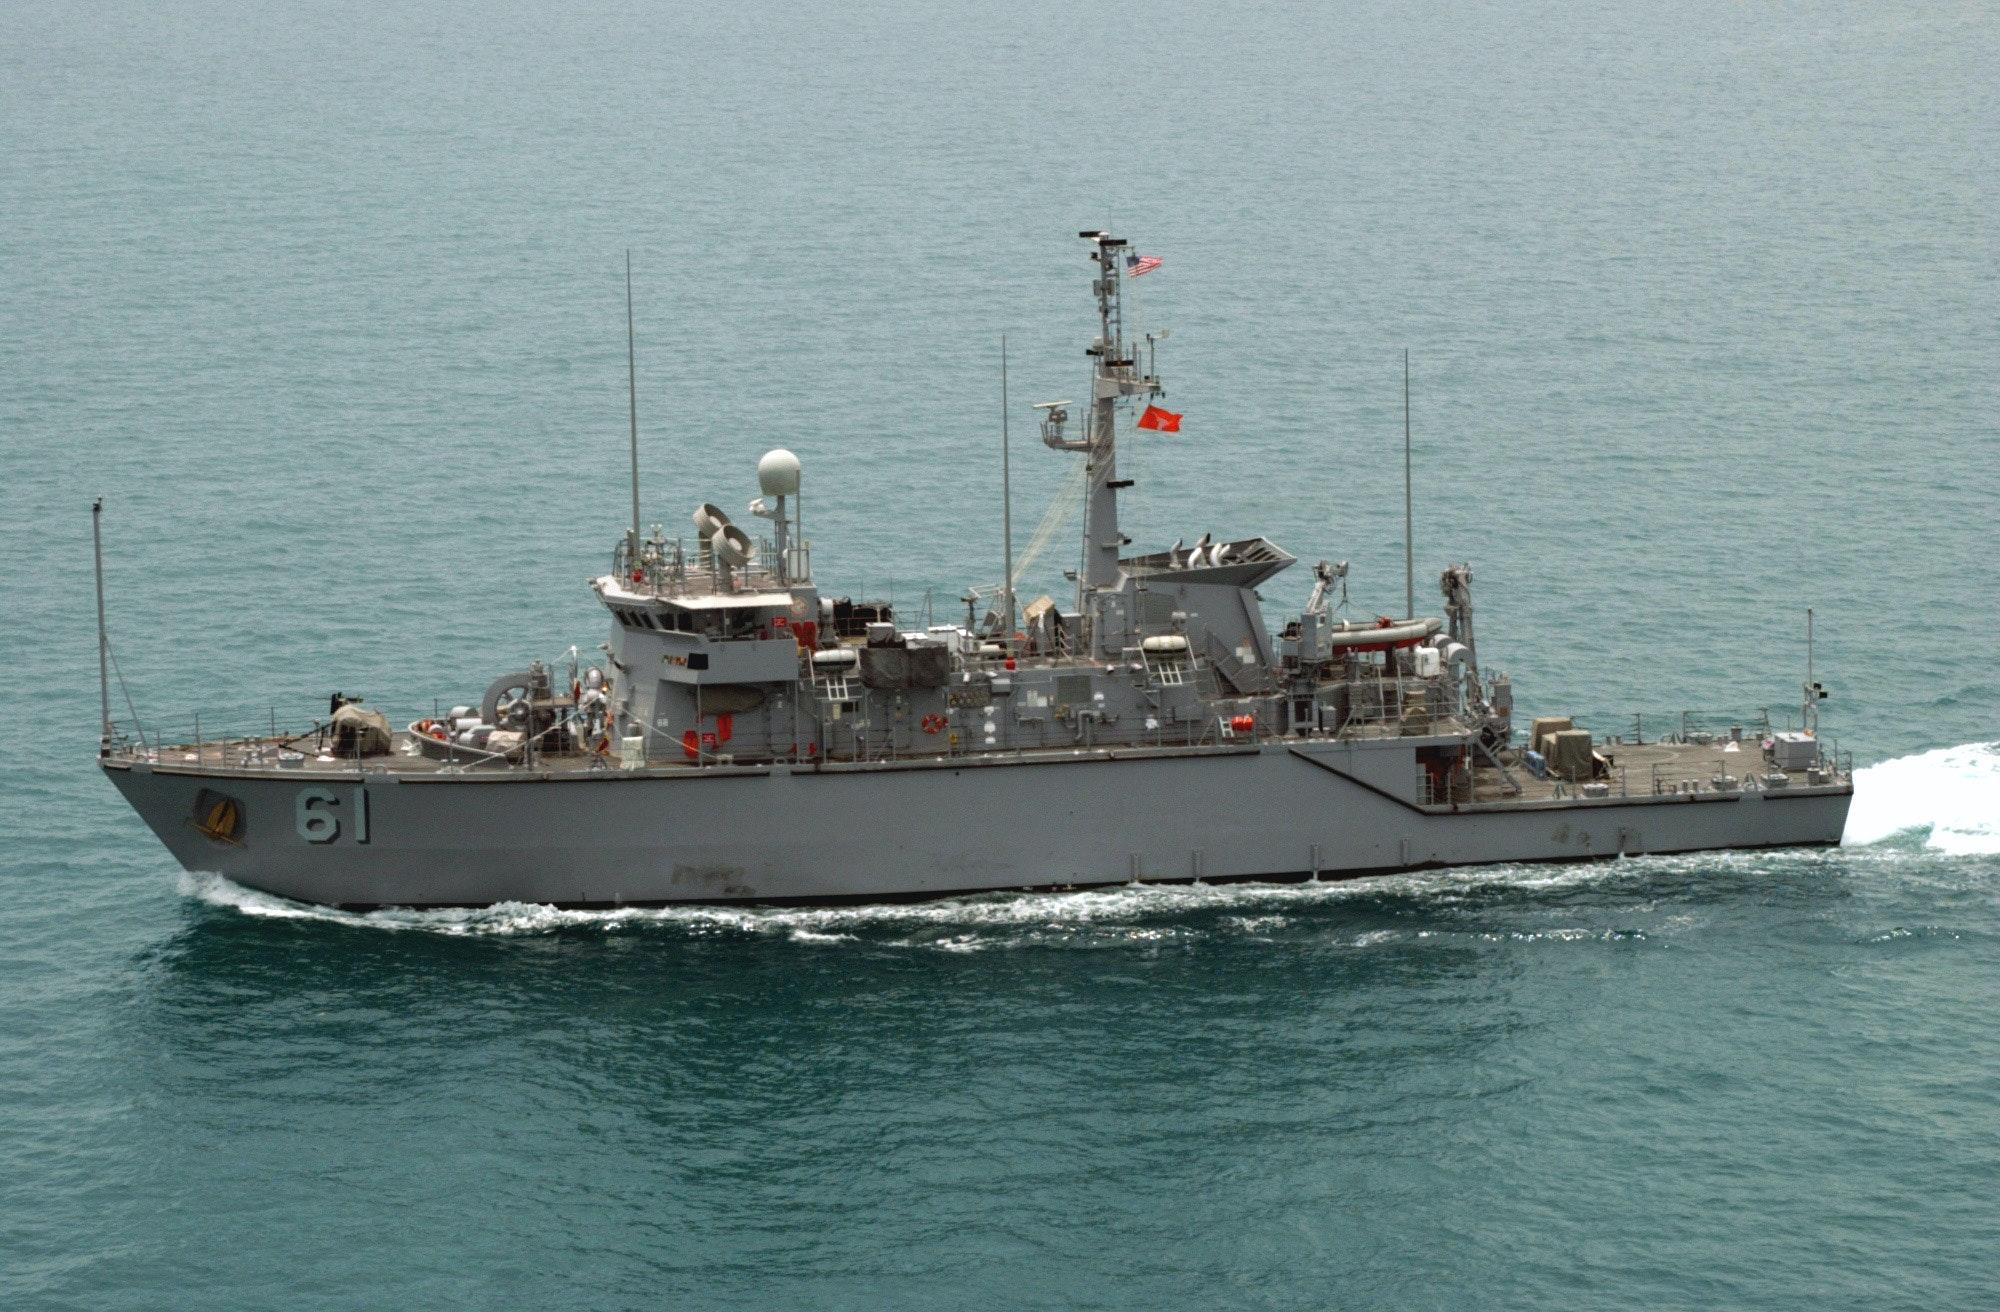 USS_Raven_MHC_61_Persian_Gulf